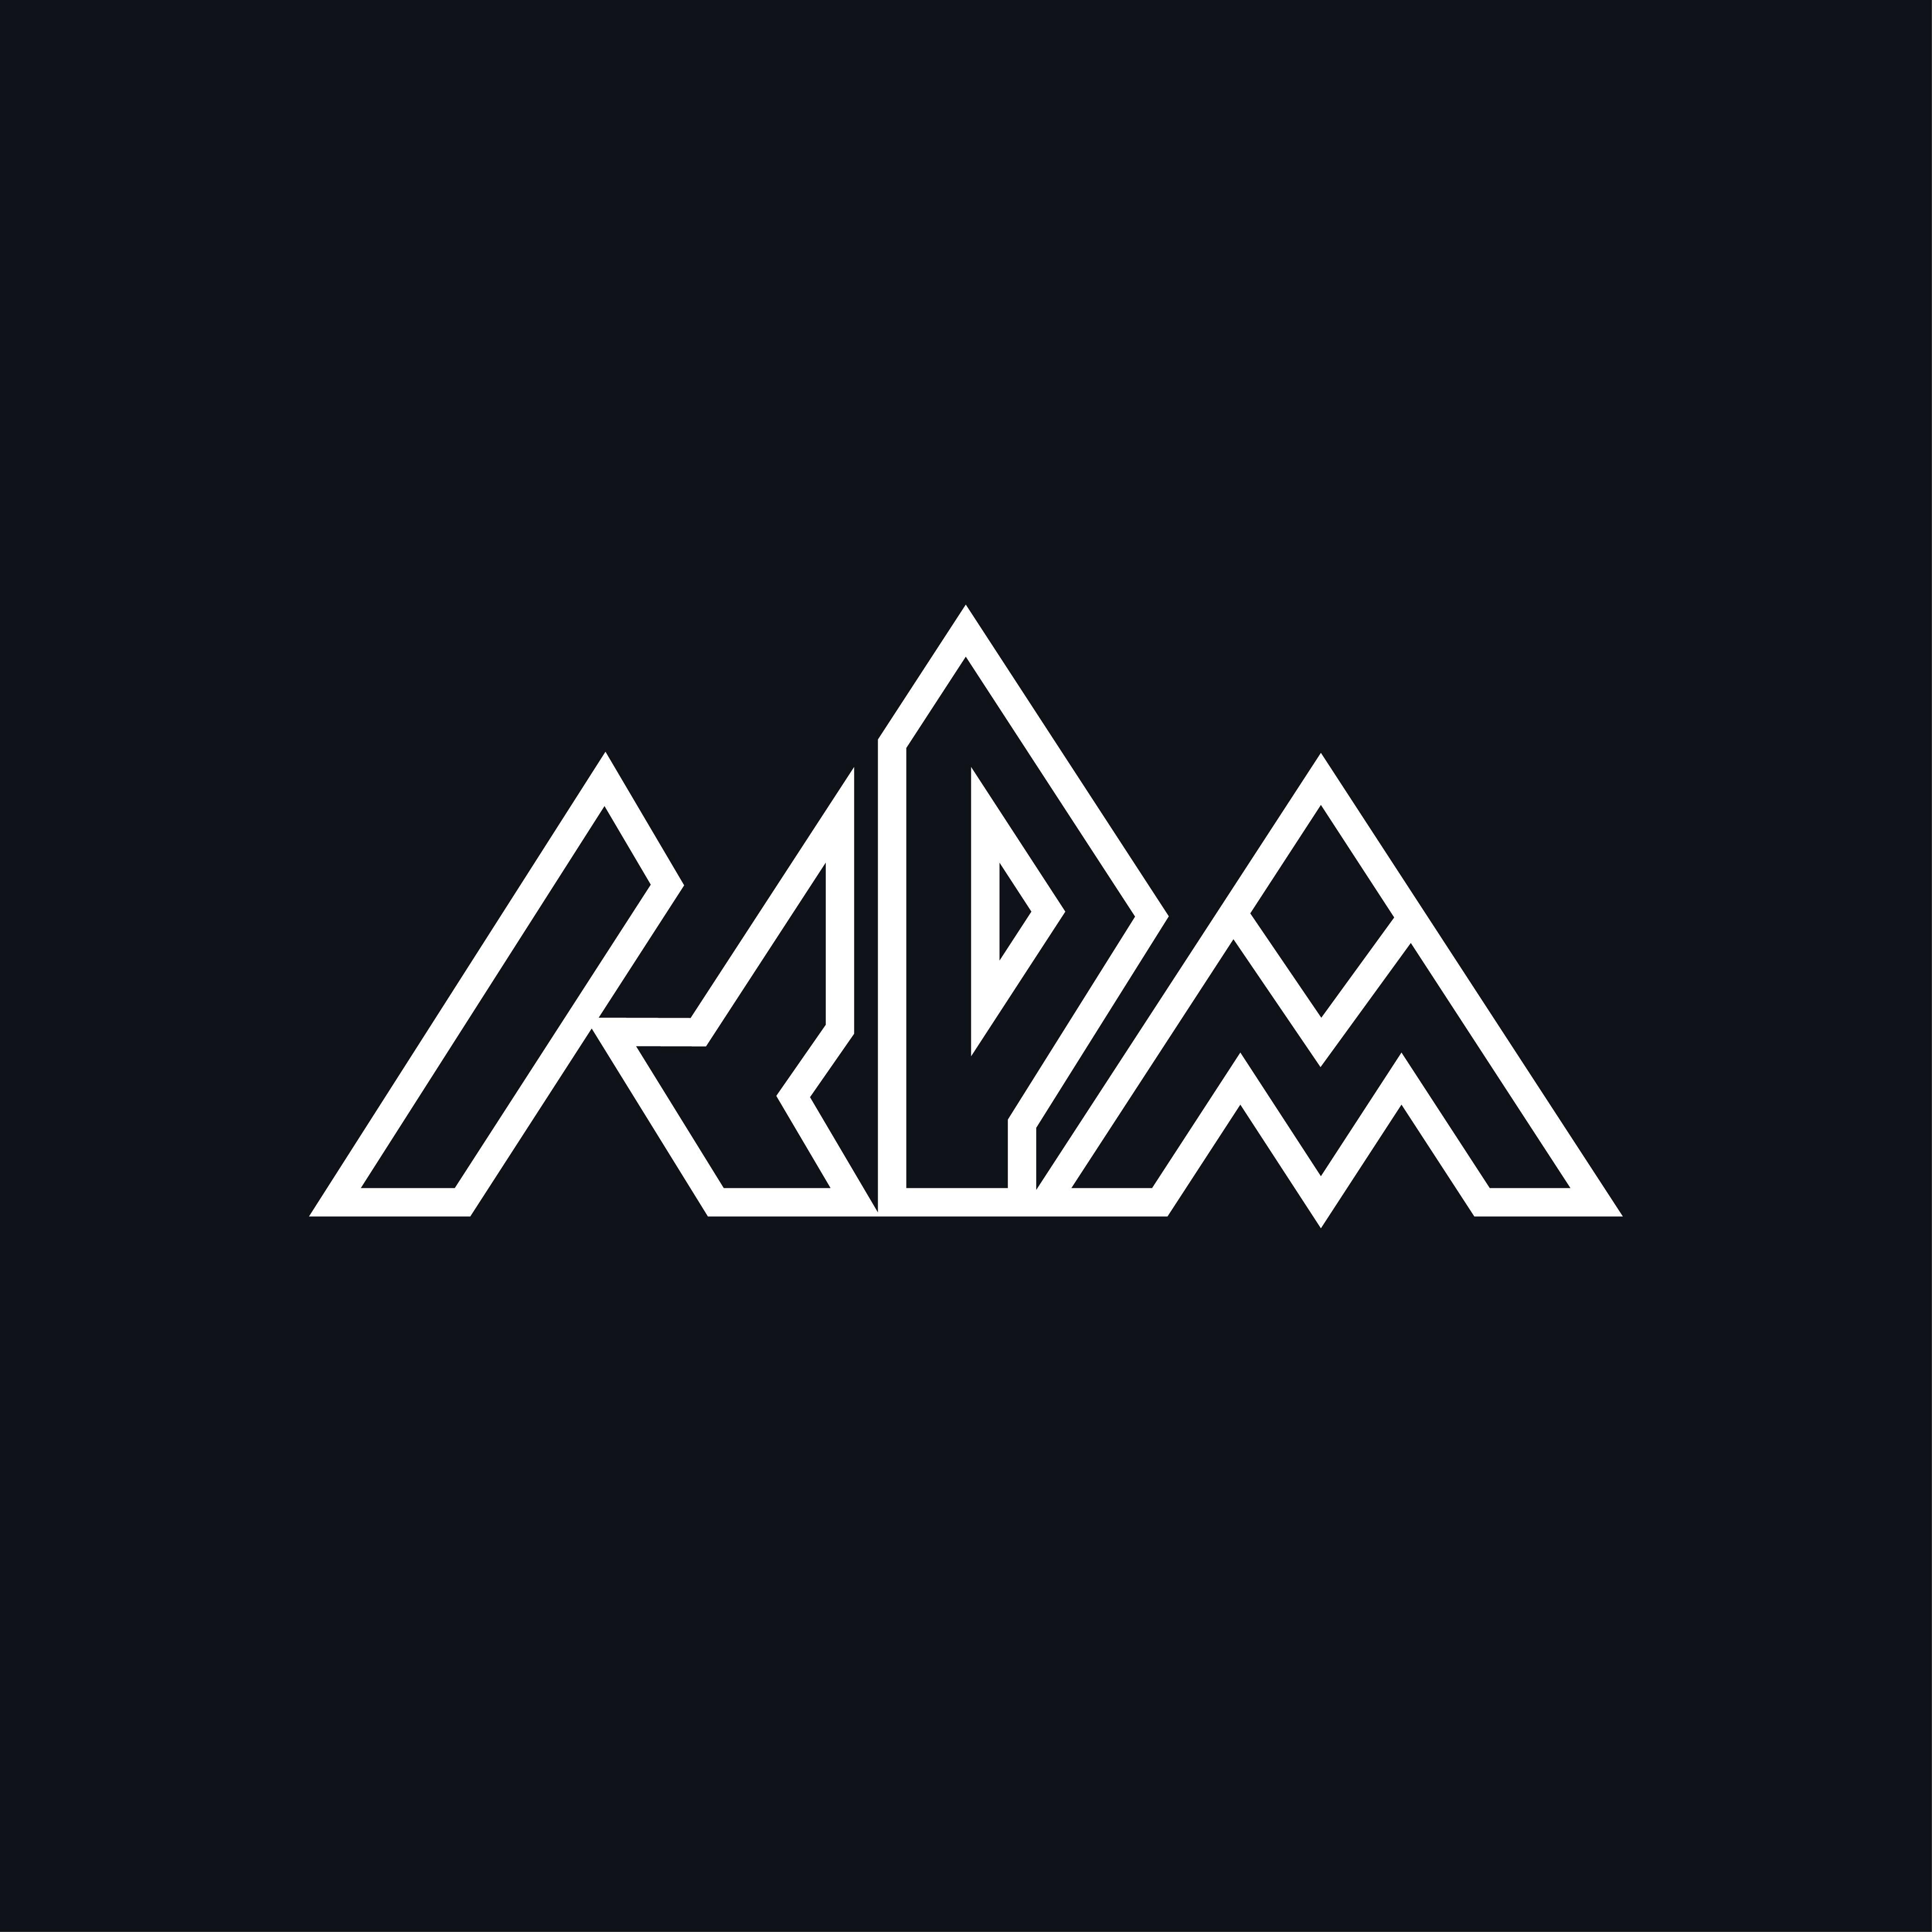 Unique logo for initials KPM